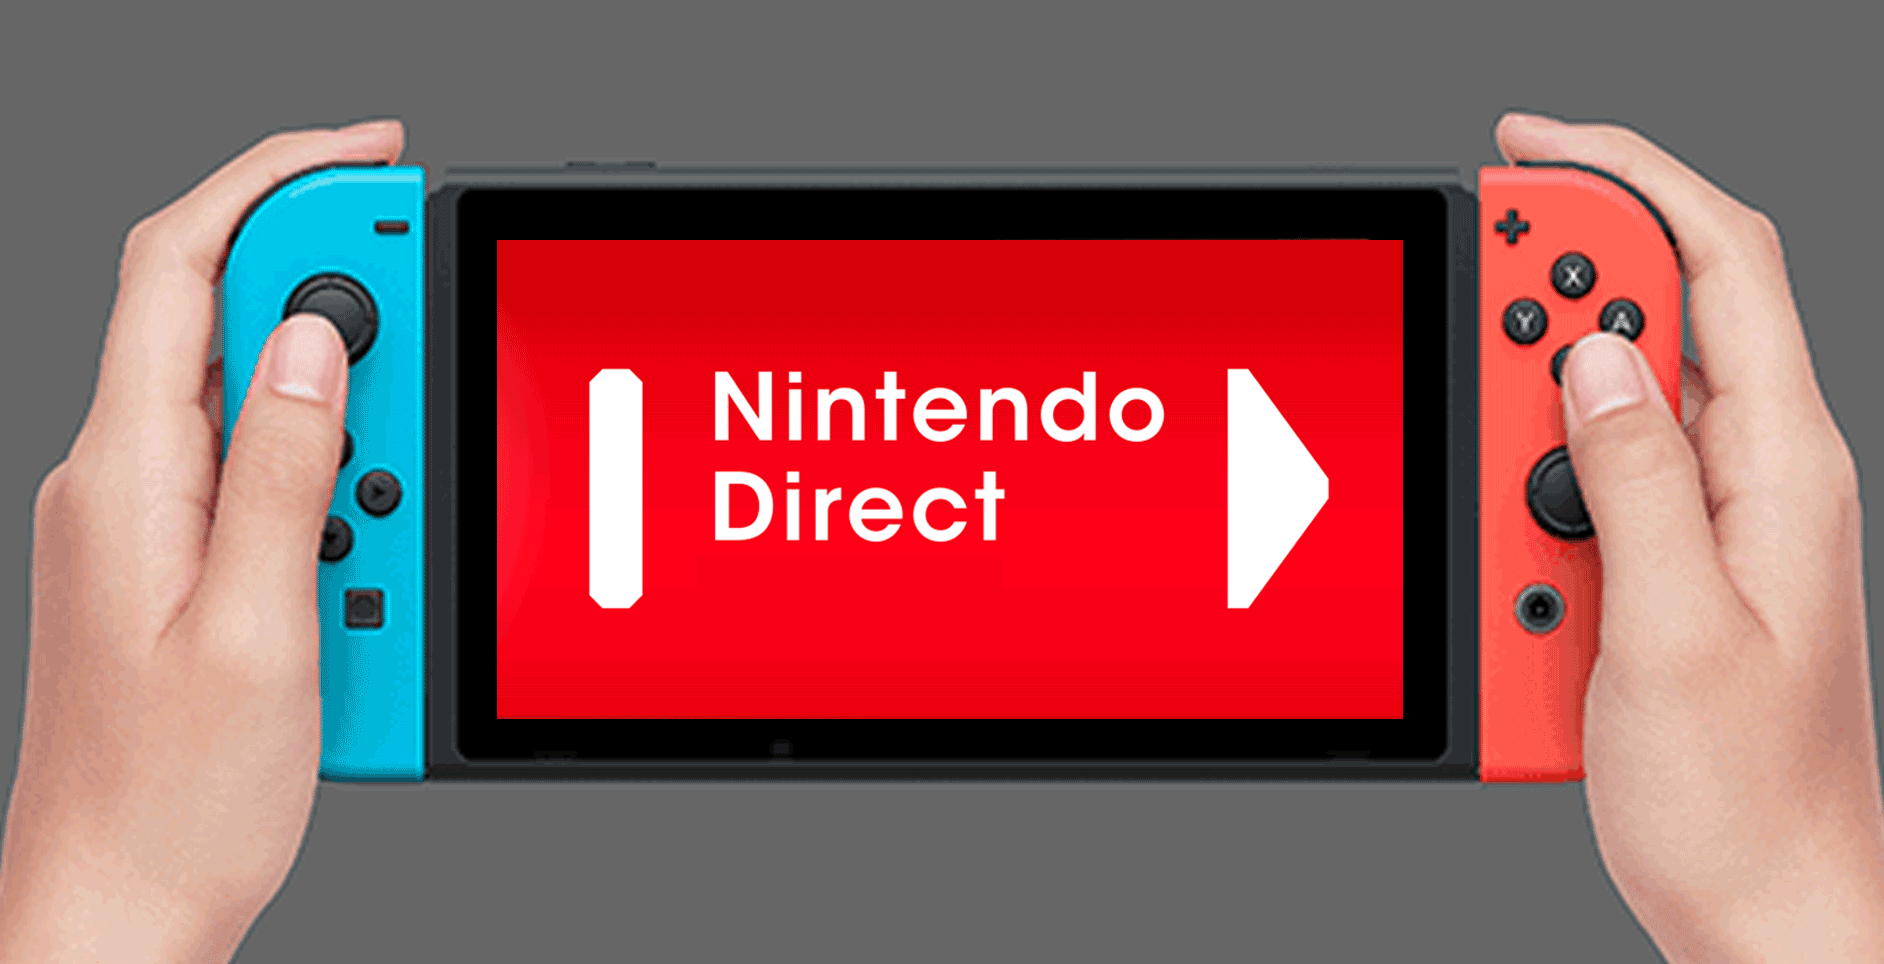 Nintendo Direct con Novedades para este 2018 en videojuegos en un grandioso evento